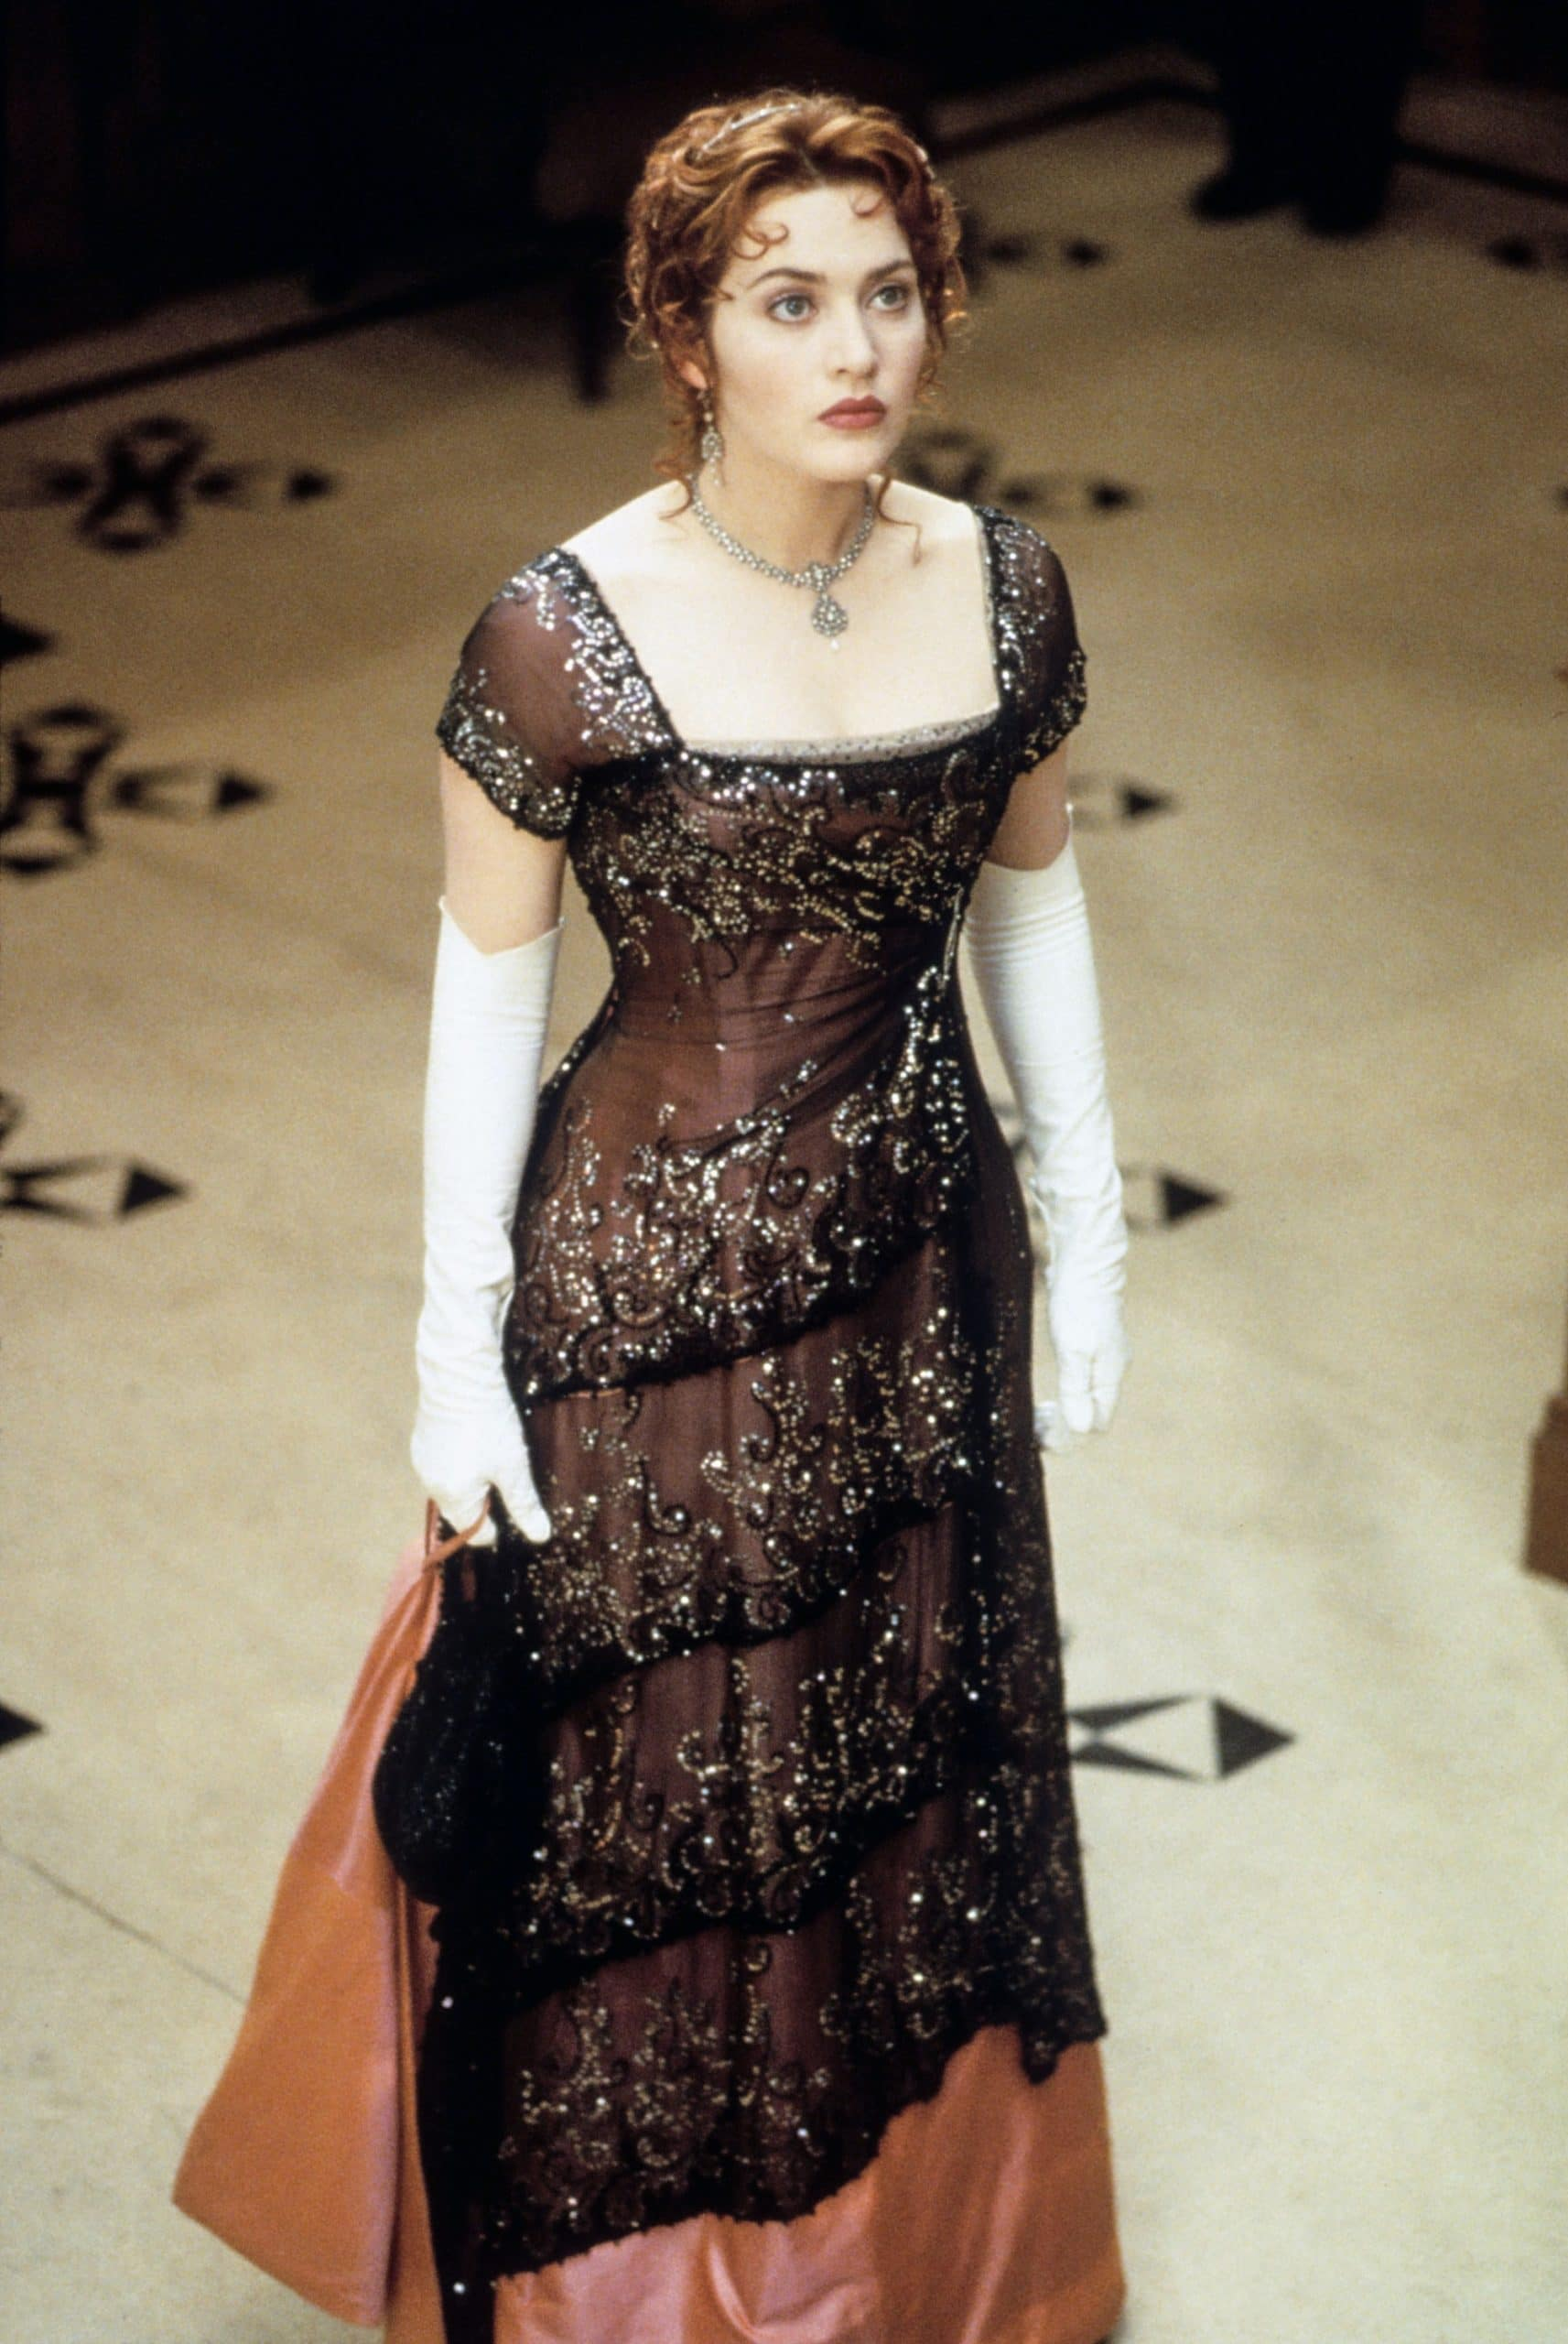 TITANIC, Kate Winslet, rose